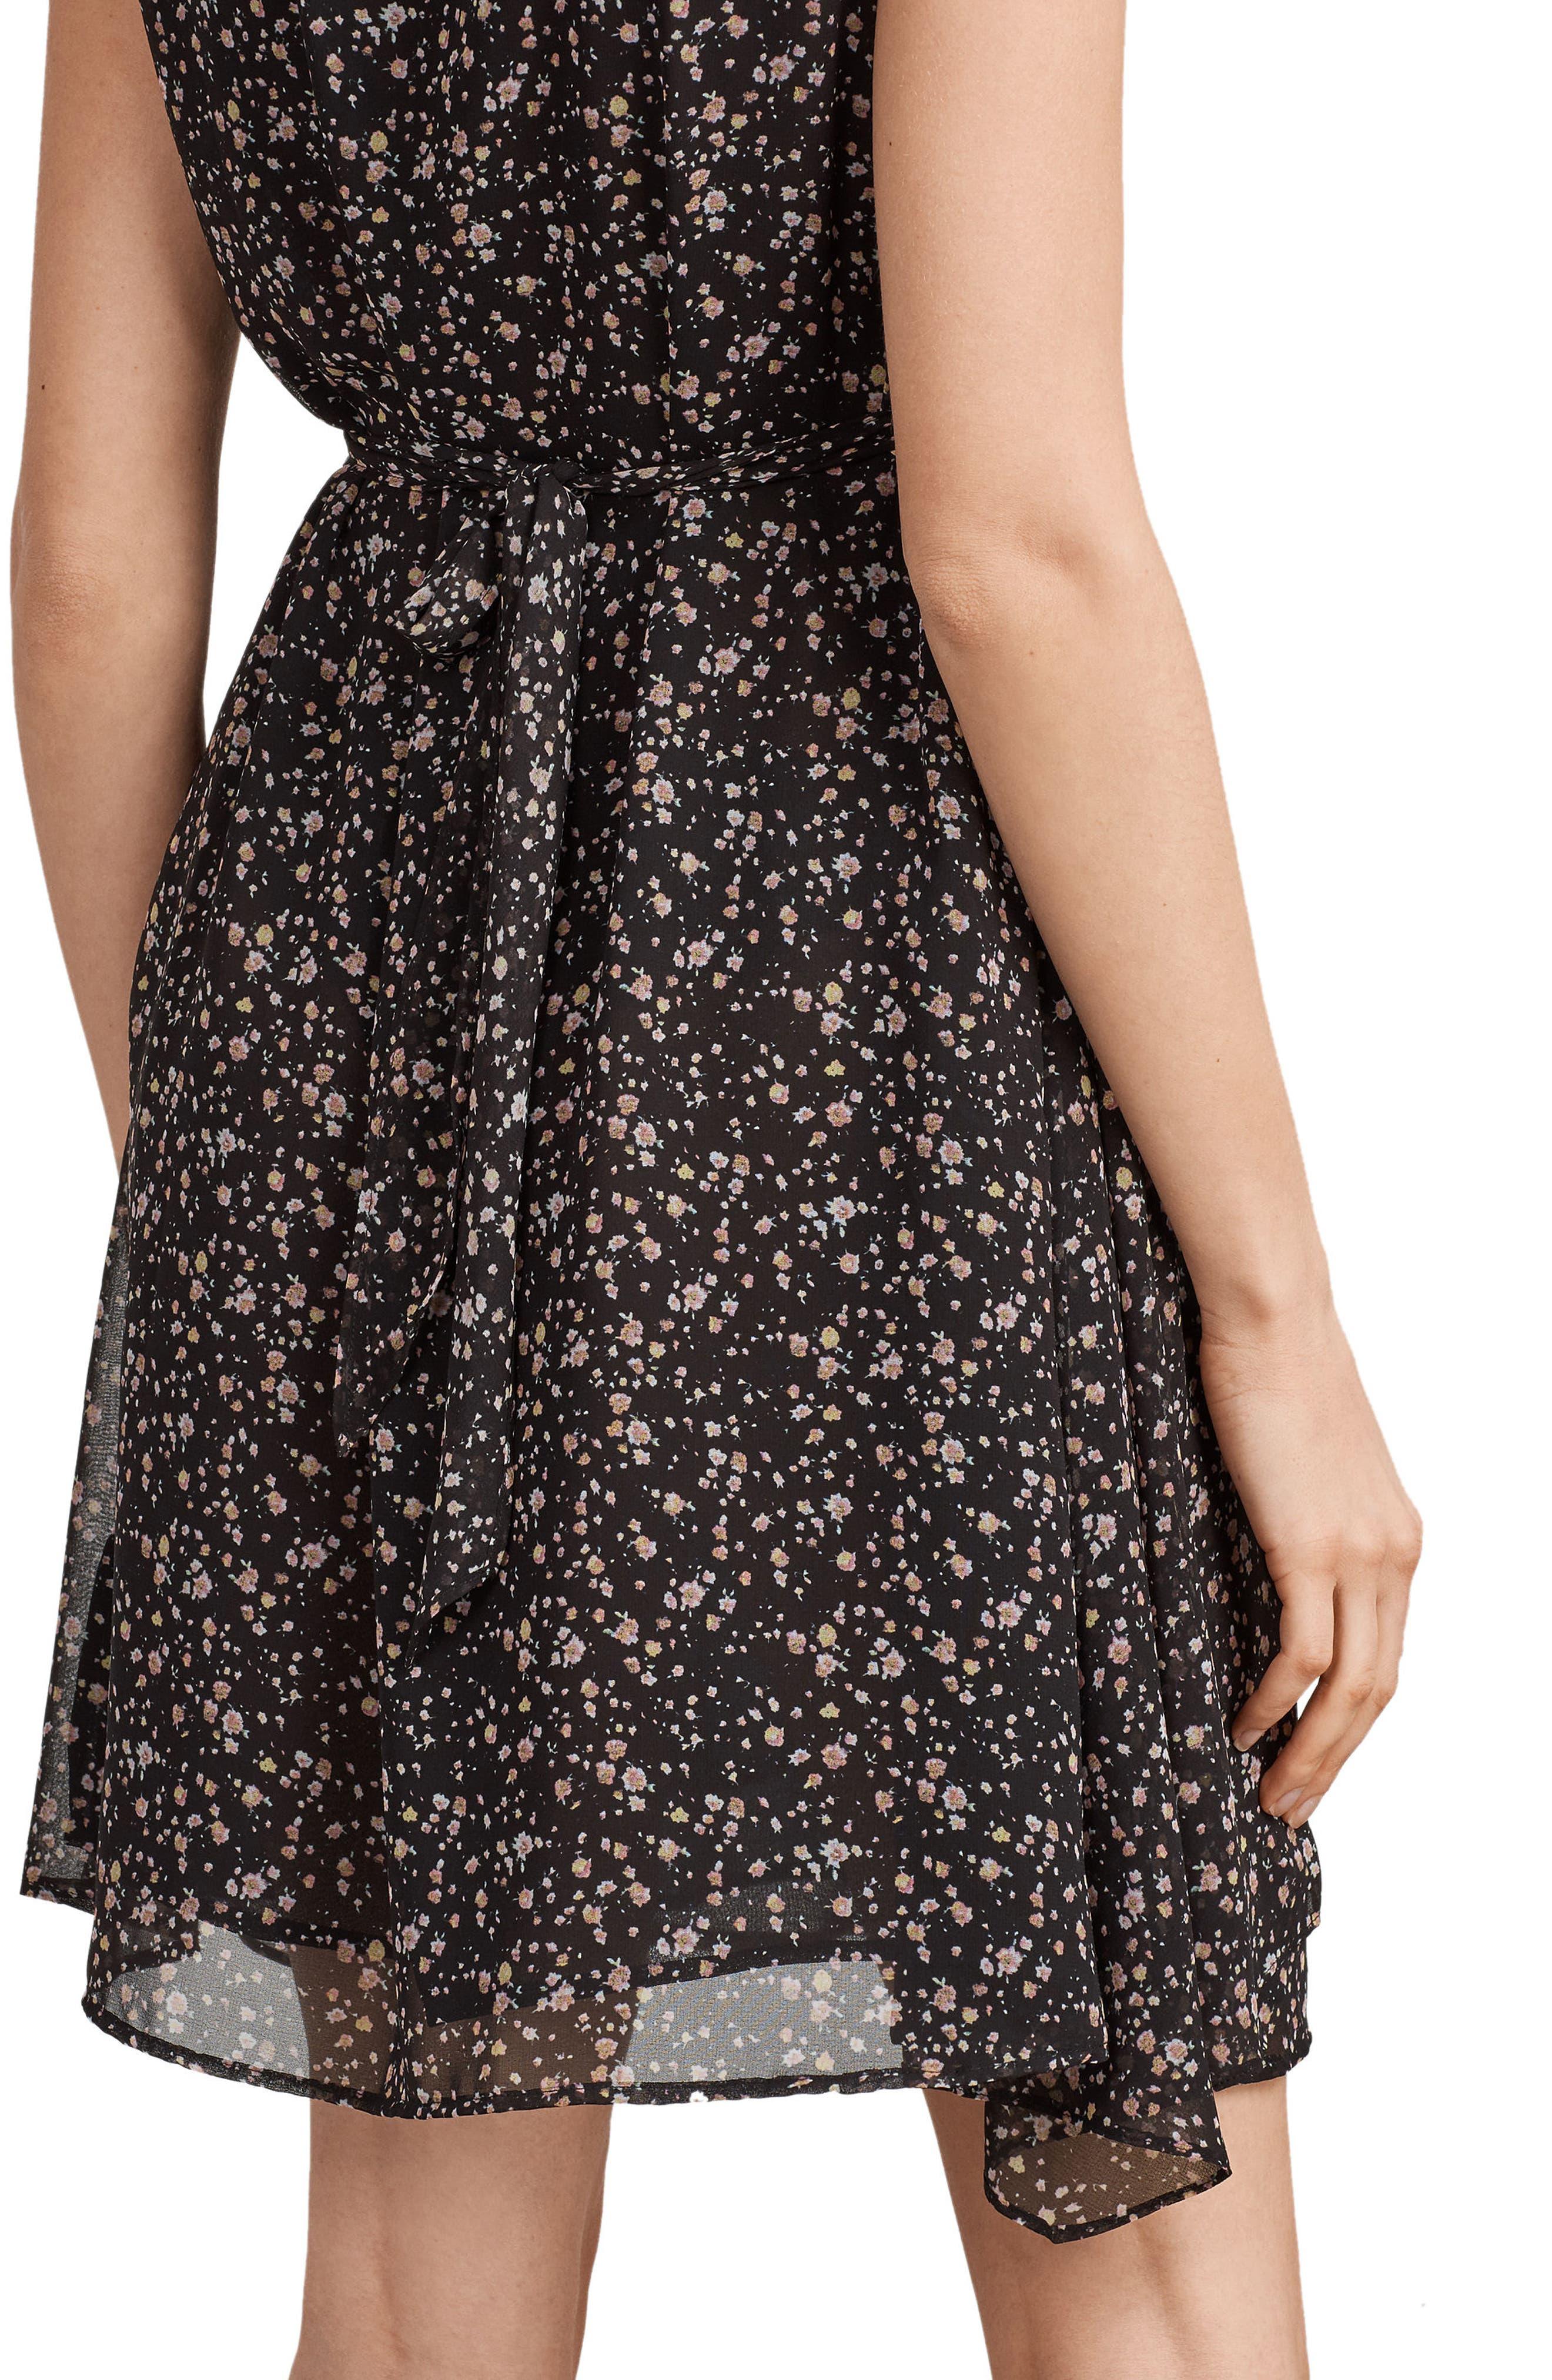 Jayda Pepper Floral Print Dress,                             Alternate thumbnail 6, color,                             001